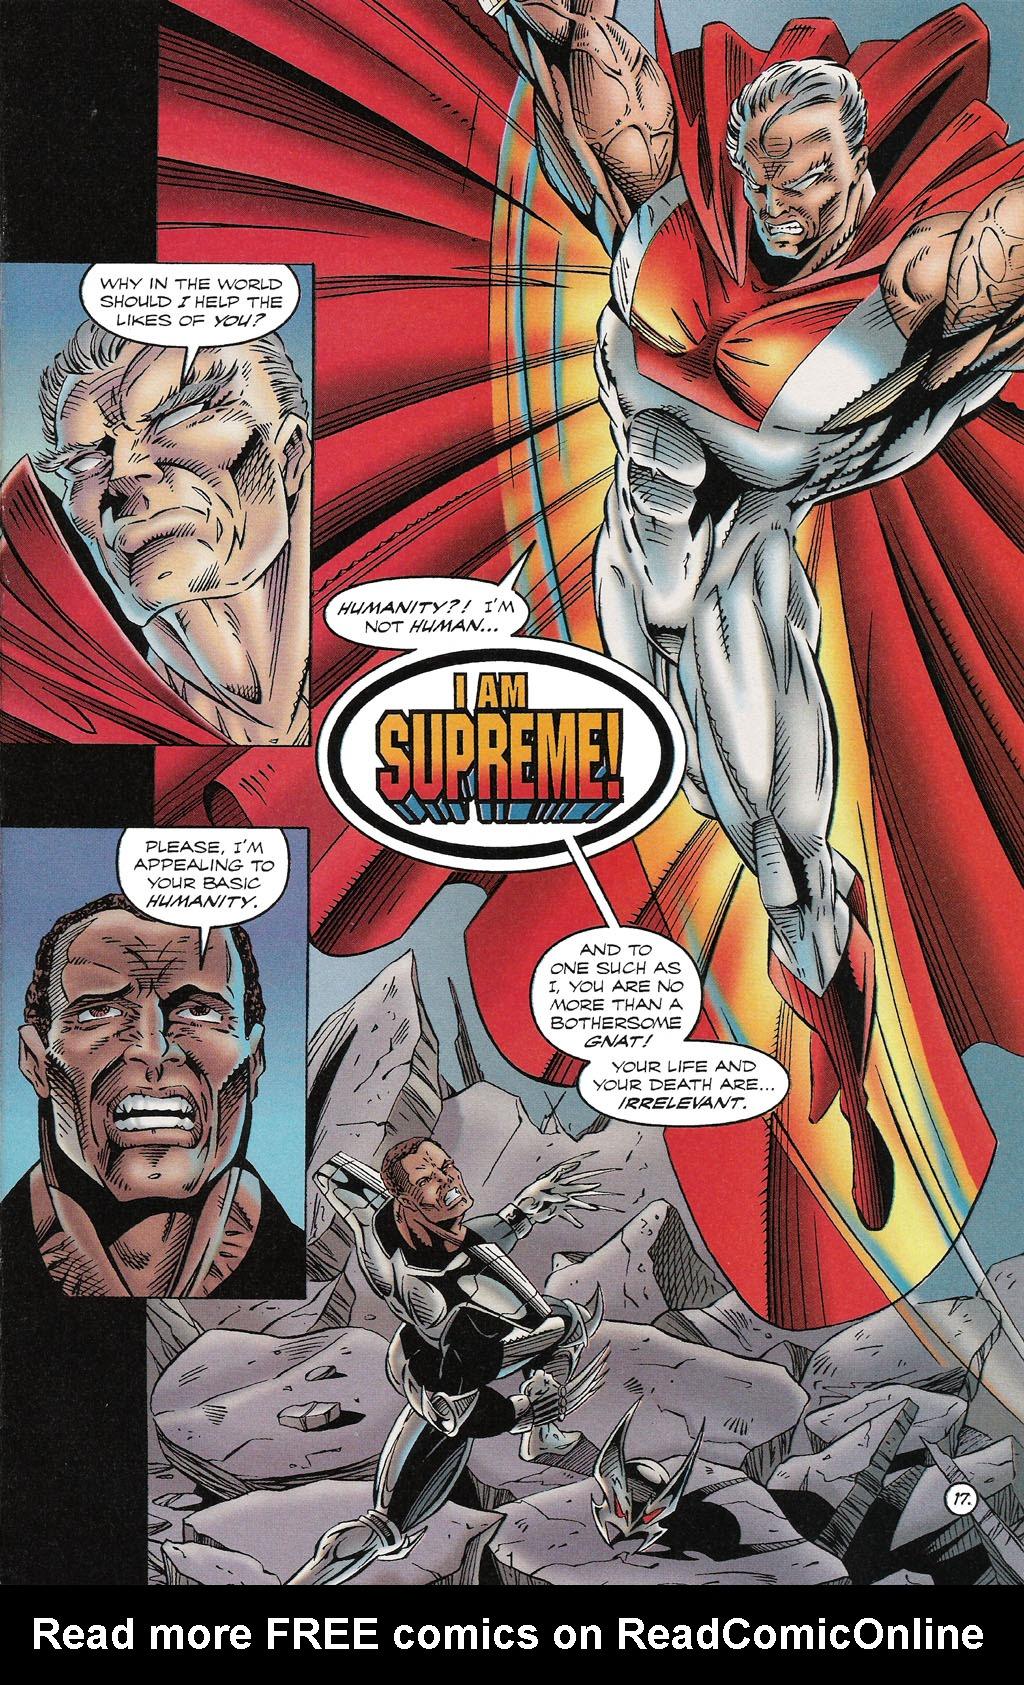 Read online ShadowHawk comic -  Issue #16 - 16